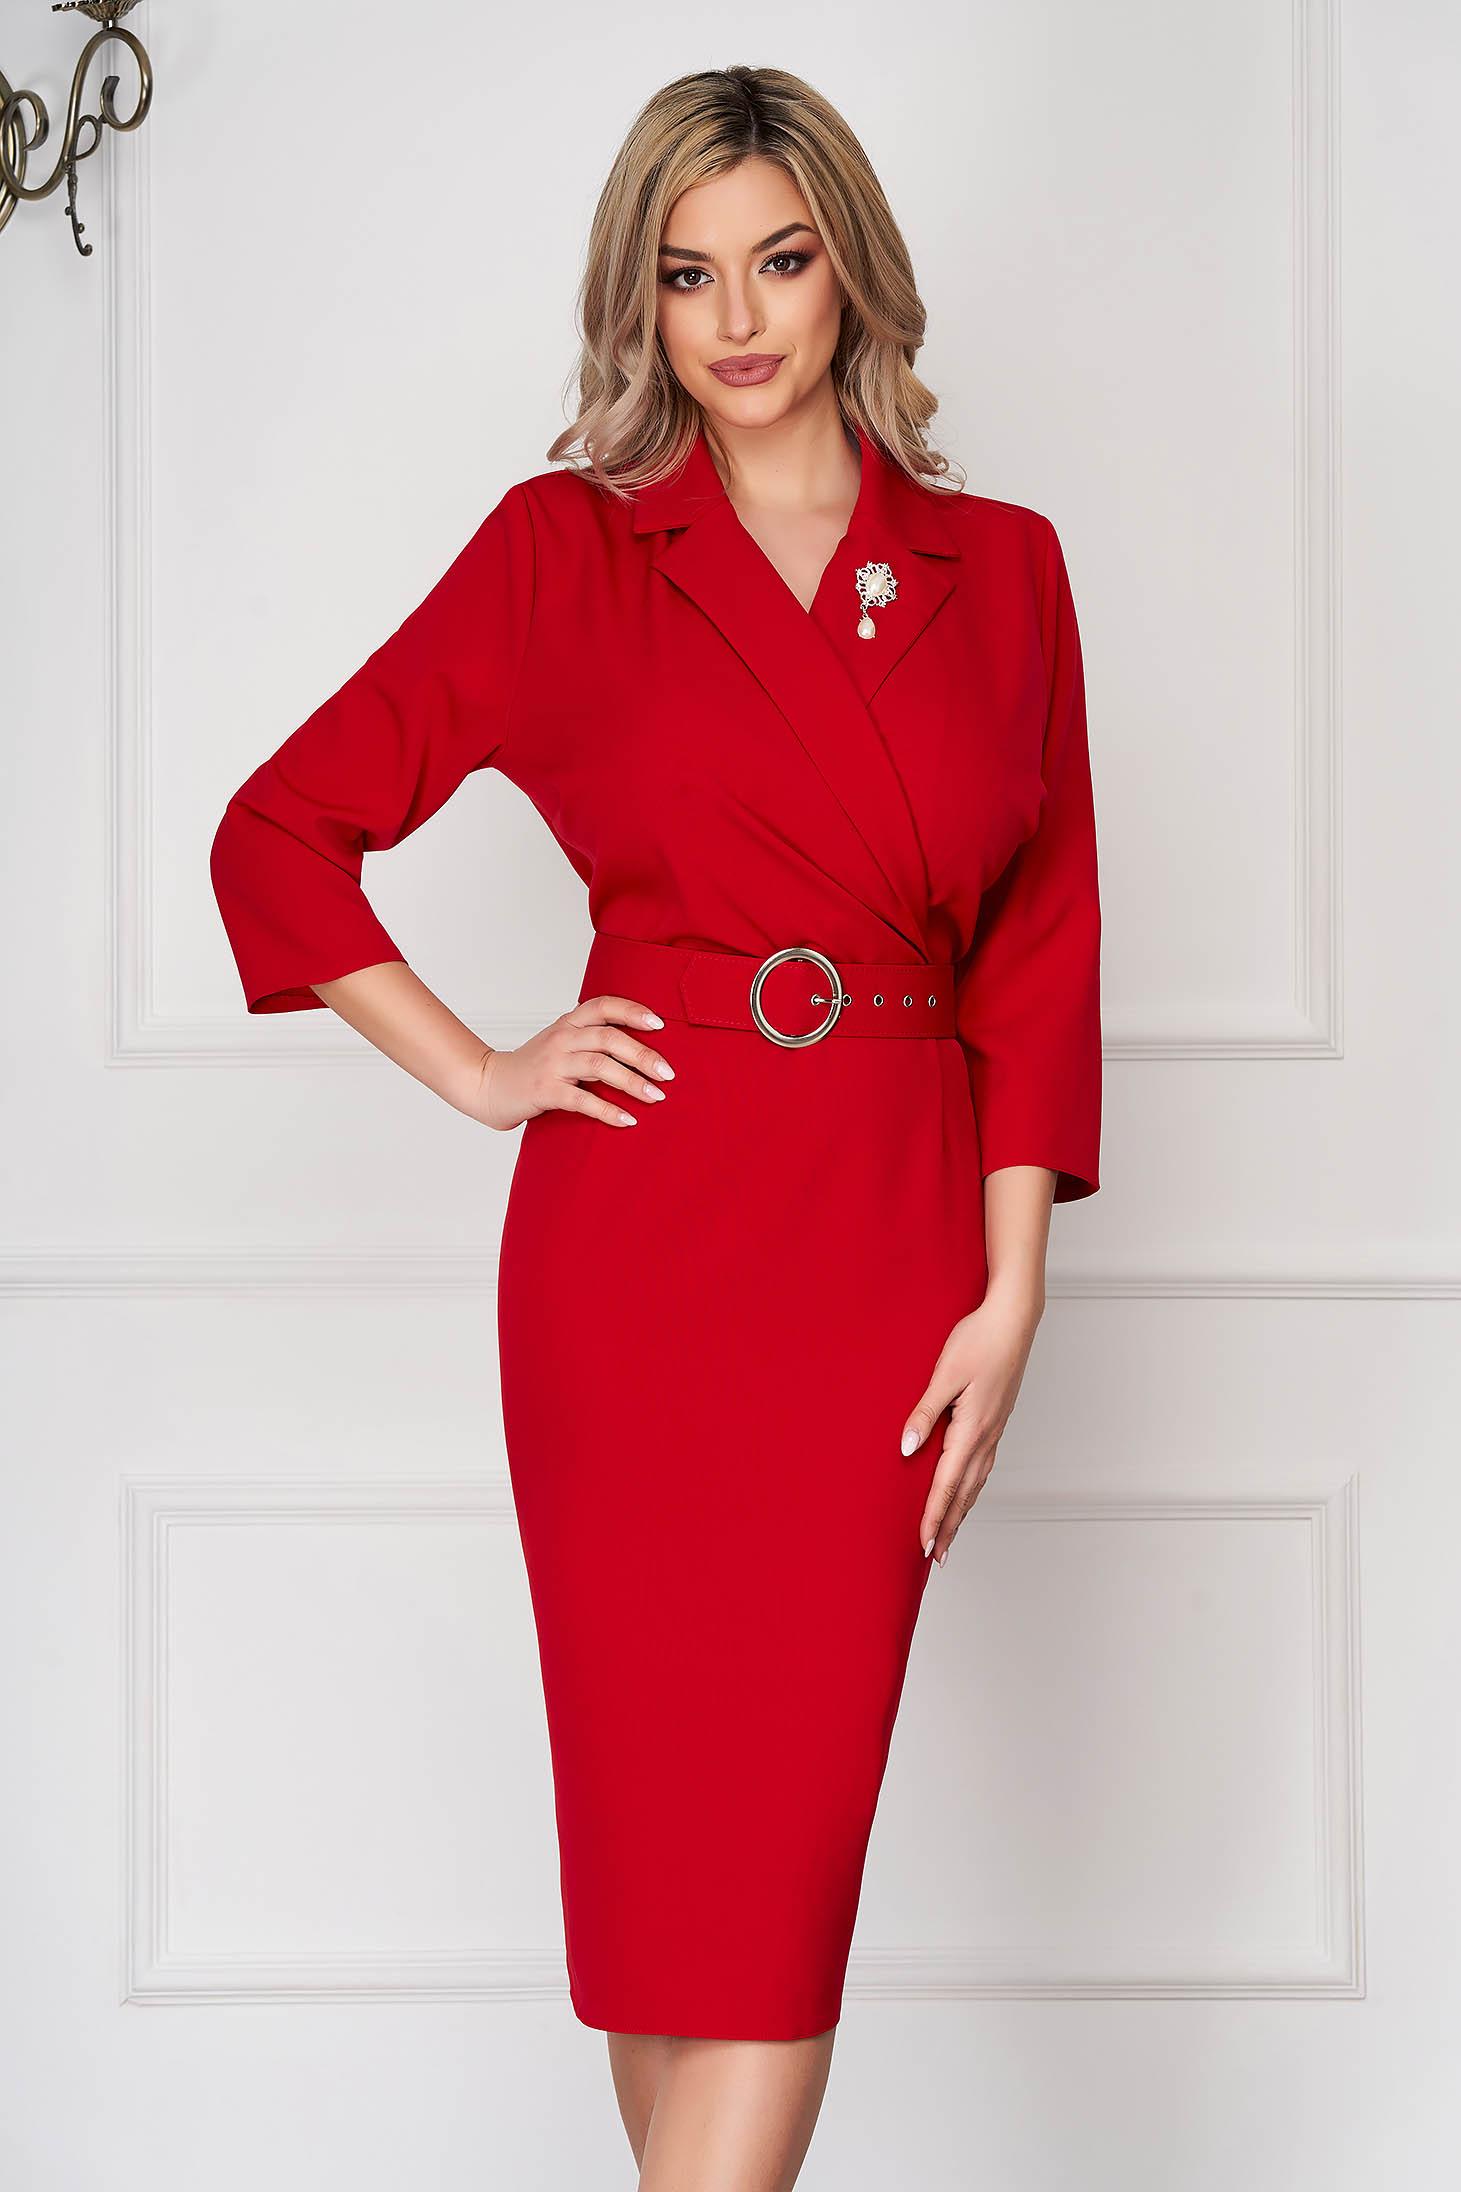 Red dress elegant midi pencil thin fabric accessorized with breastpin